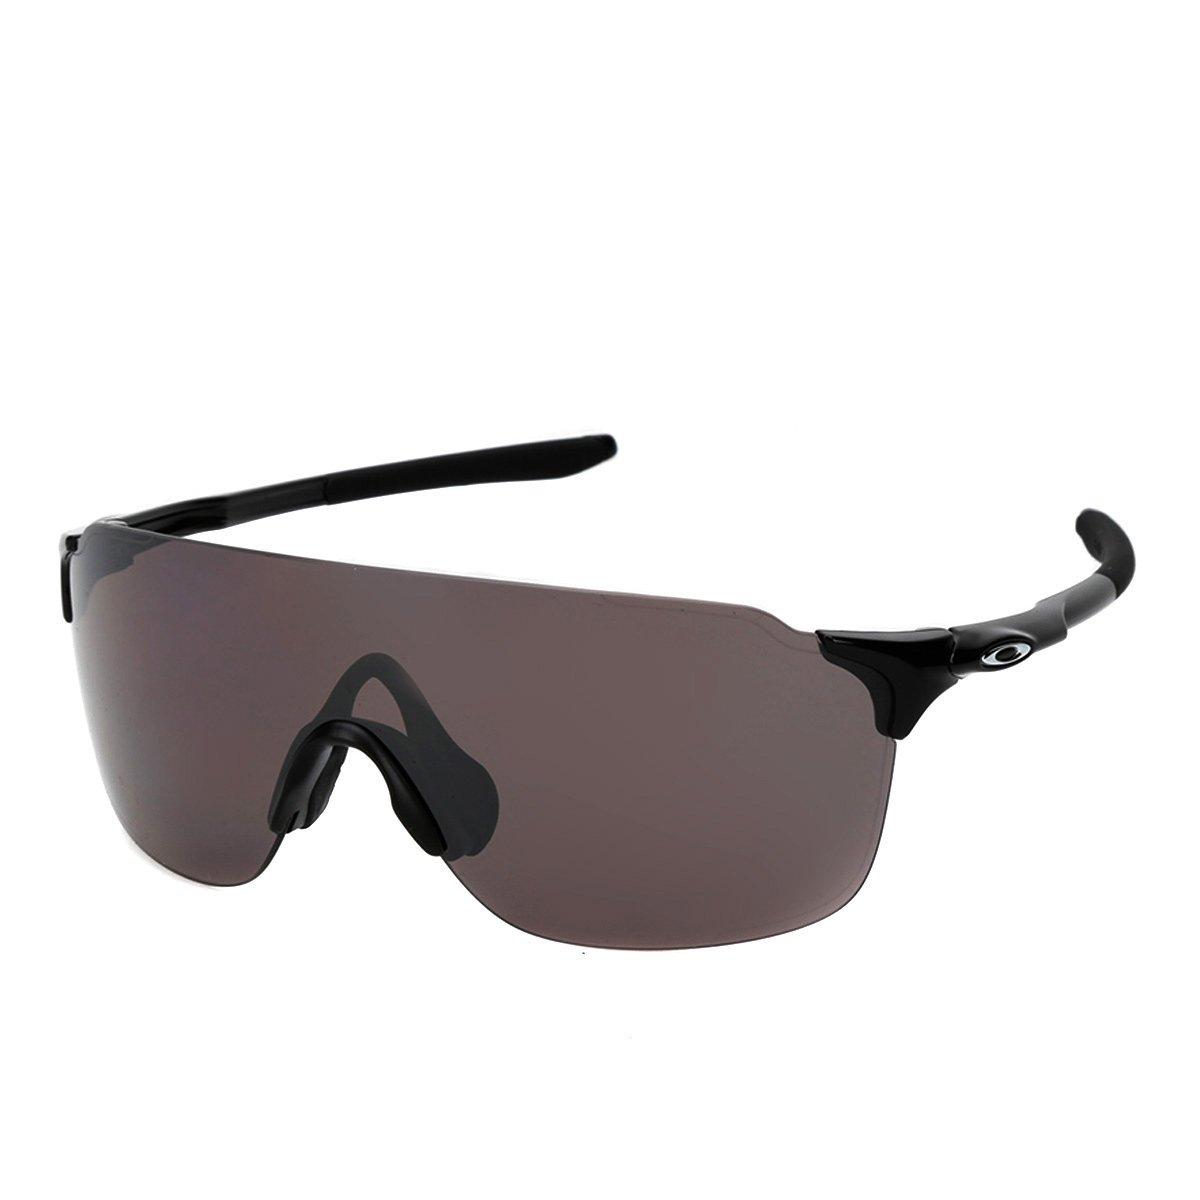 992a6a2f000a3 Óculos Oakley Evzero Stride Prizm Trail Polarizado - Compre Agora ...